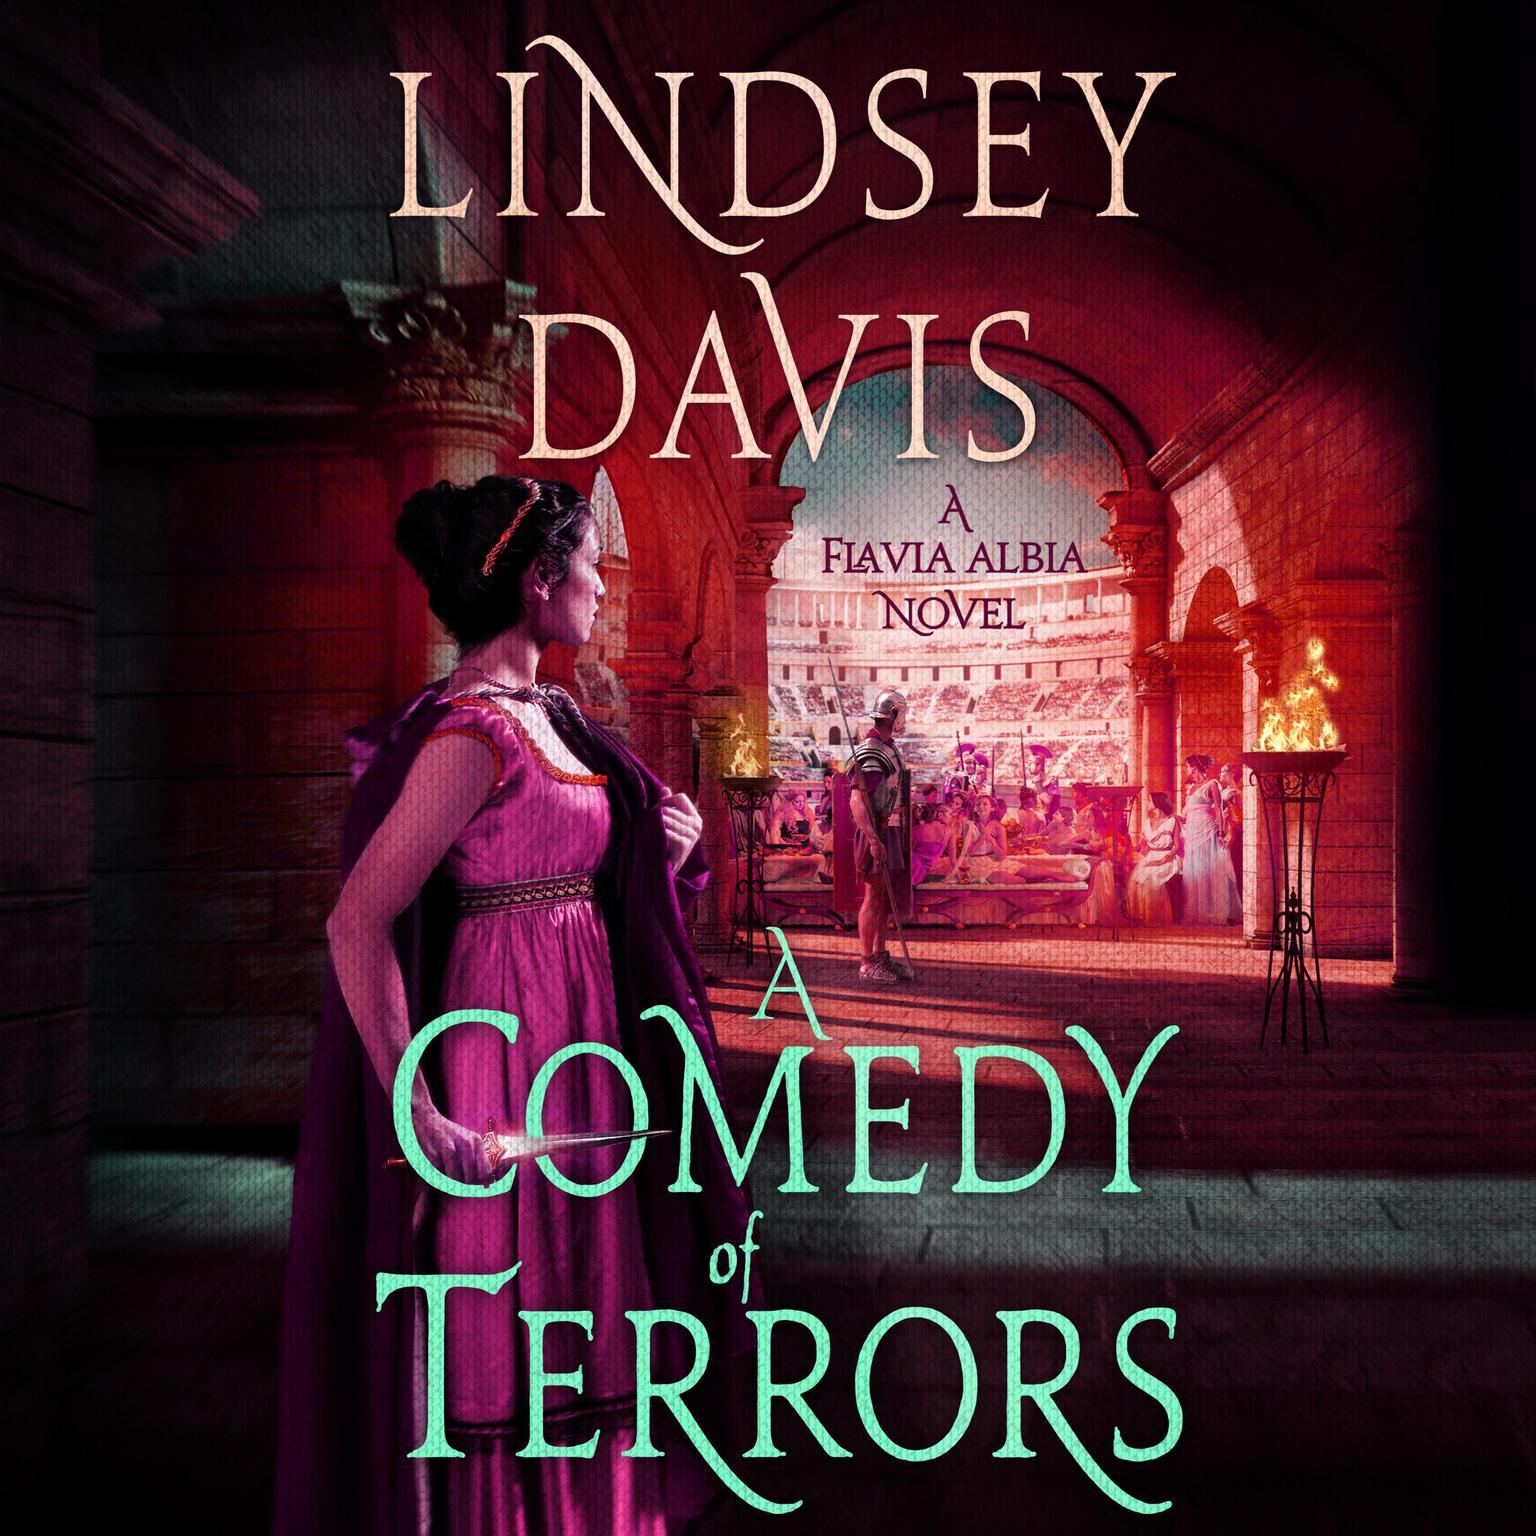 A Comedy of Terrors: A Flavia Albia Novel Audiobook, by Lindsey Davis